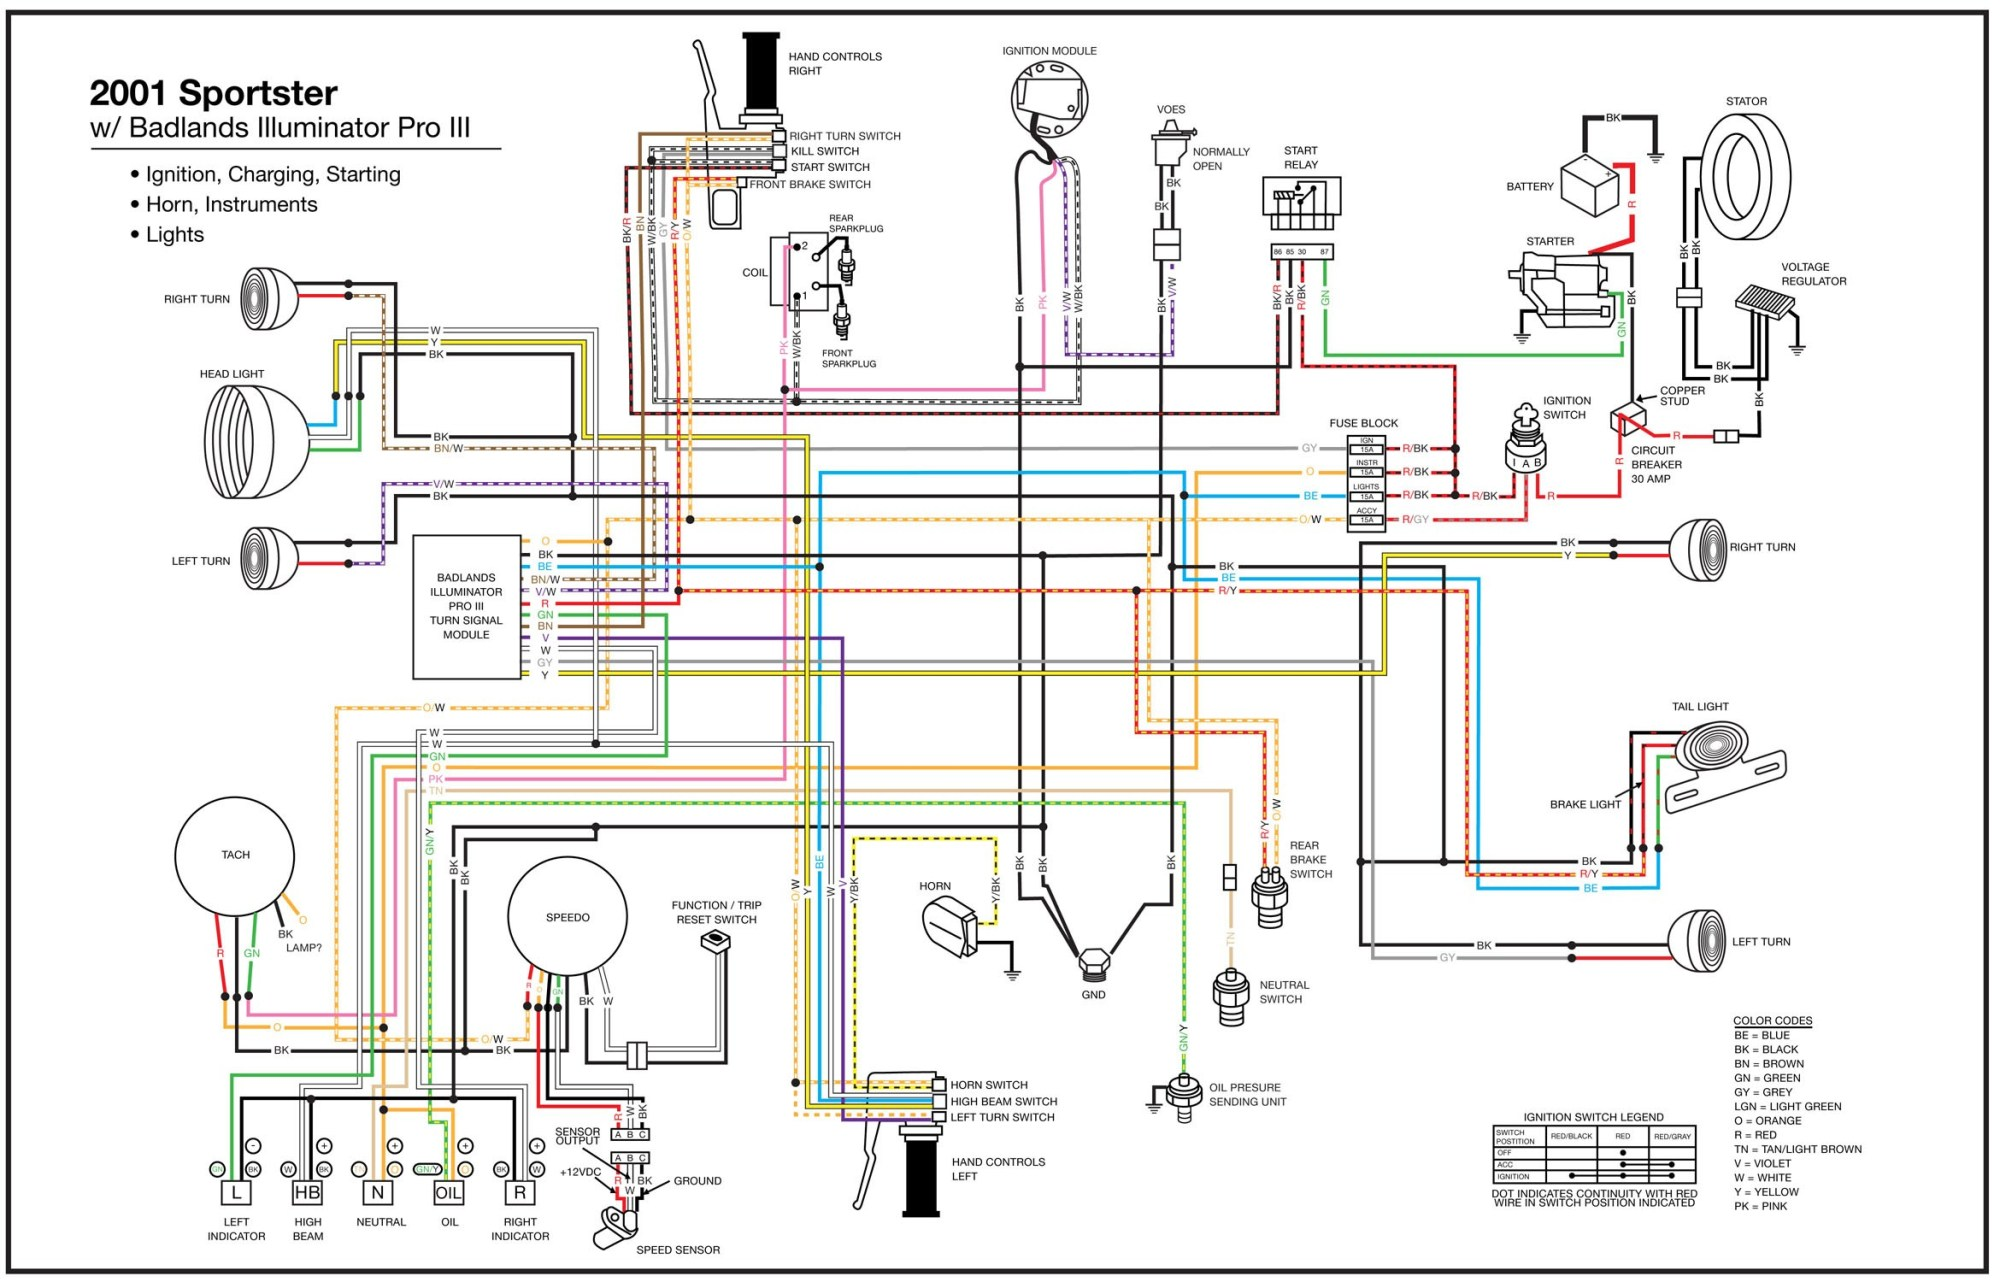 hight resolution of 1989 harley davidson wiring diagram wiring diagram perfomance harle davidson ac wiring diagrams